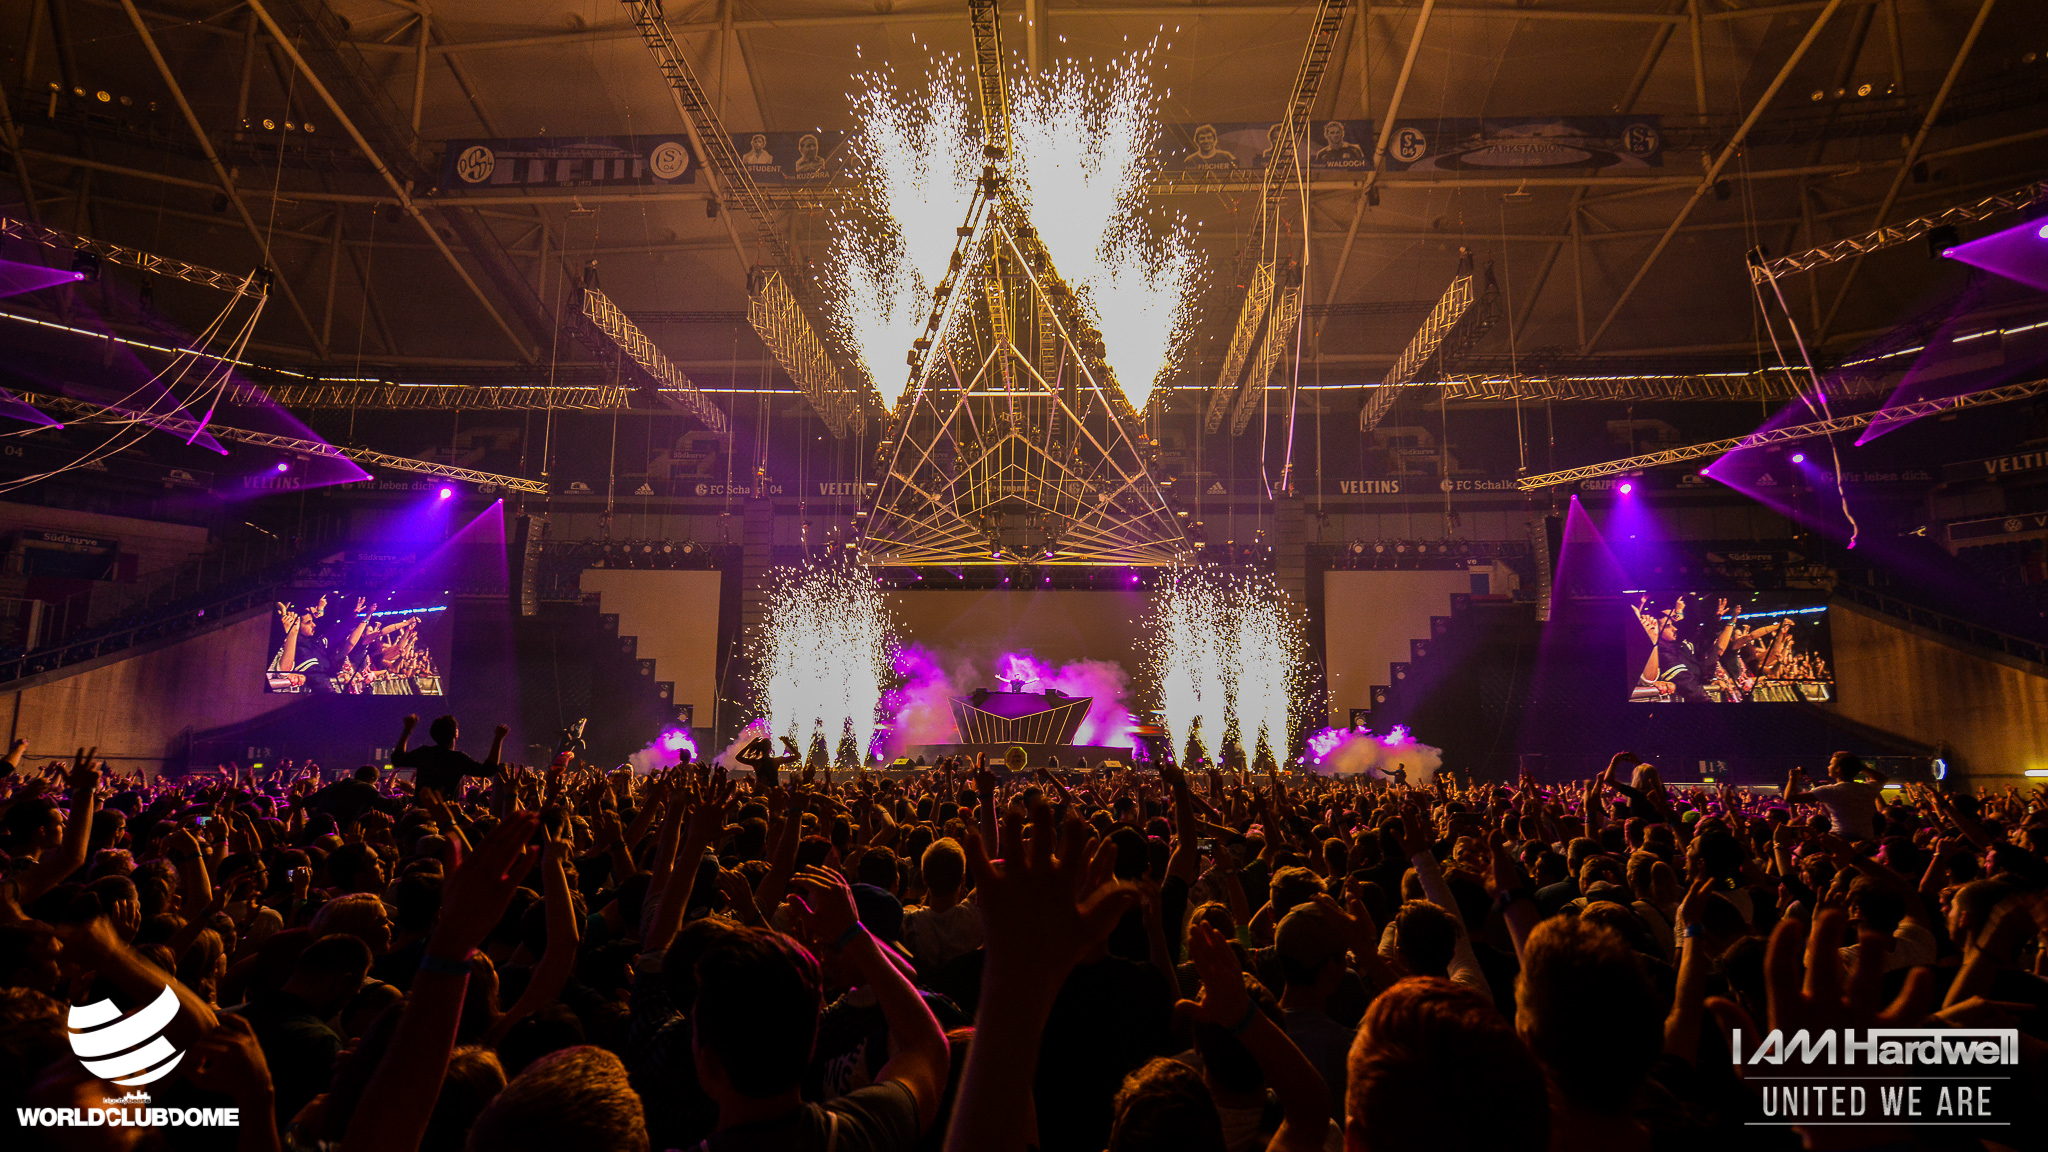 BigCityBeats kündigt erste Acts für den WORLD CLUB DOME 2016 an